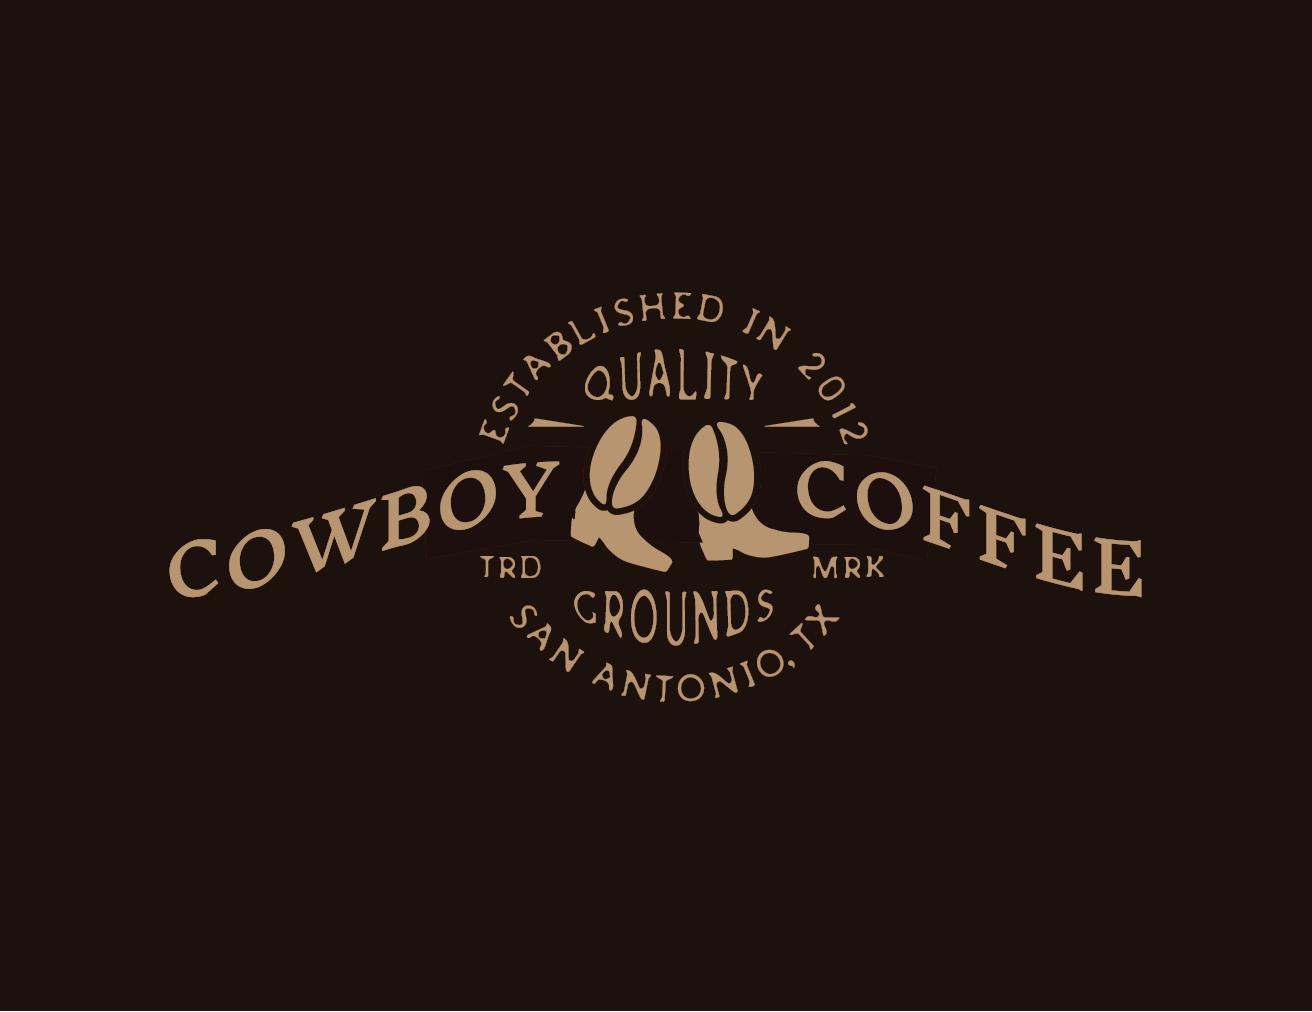 LB-cowboy coffee.png